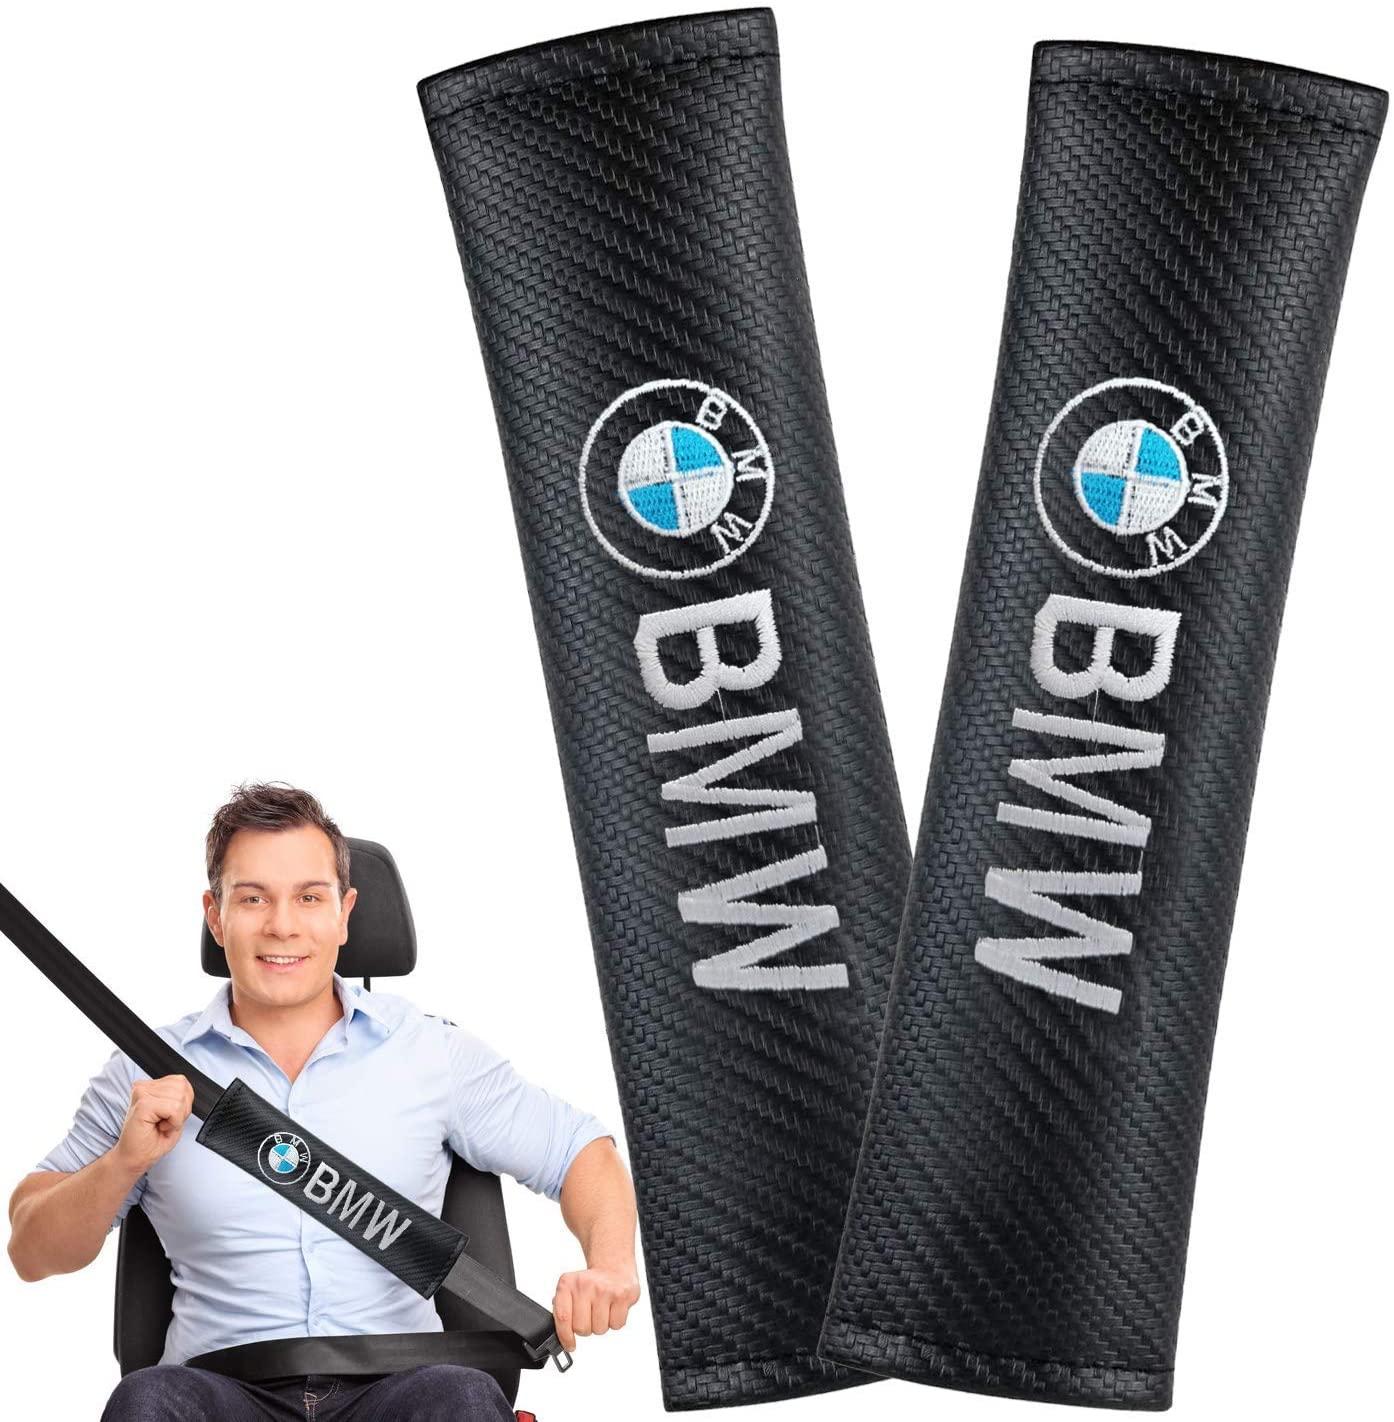 2 Pcs Car Seat Belt Shoulder Pads with BMW Logo Embroidered, Car Seat Belt Covers Black Carbon Fiber Leather Shoulder Pads, Universal Car Decoration Accessories Fit for BMW